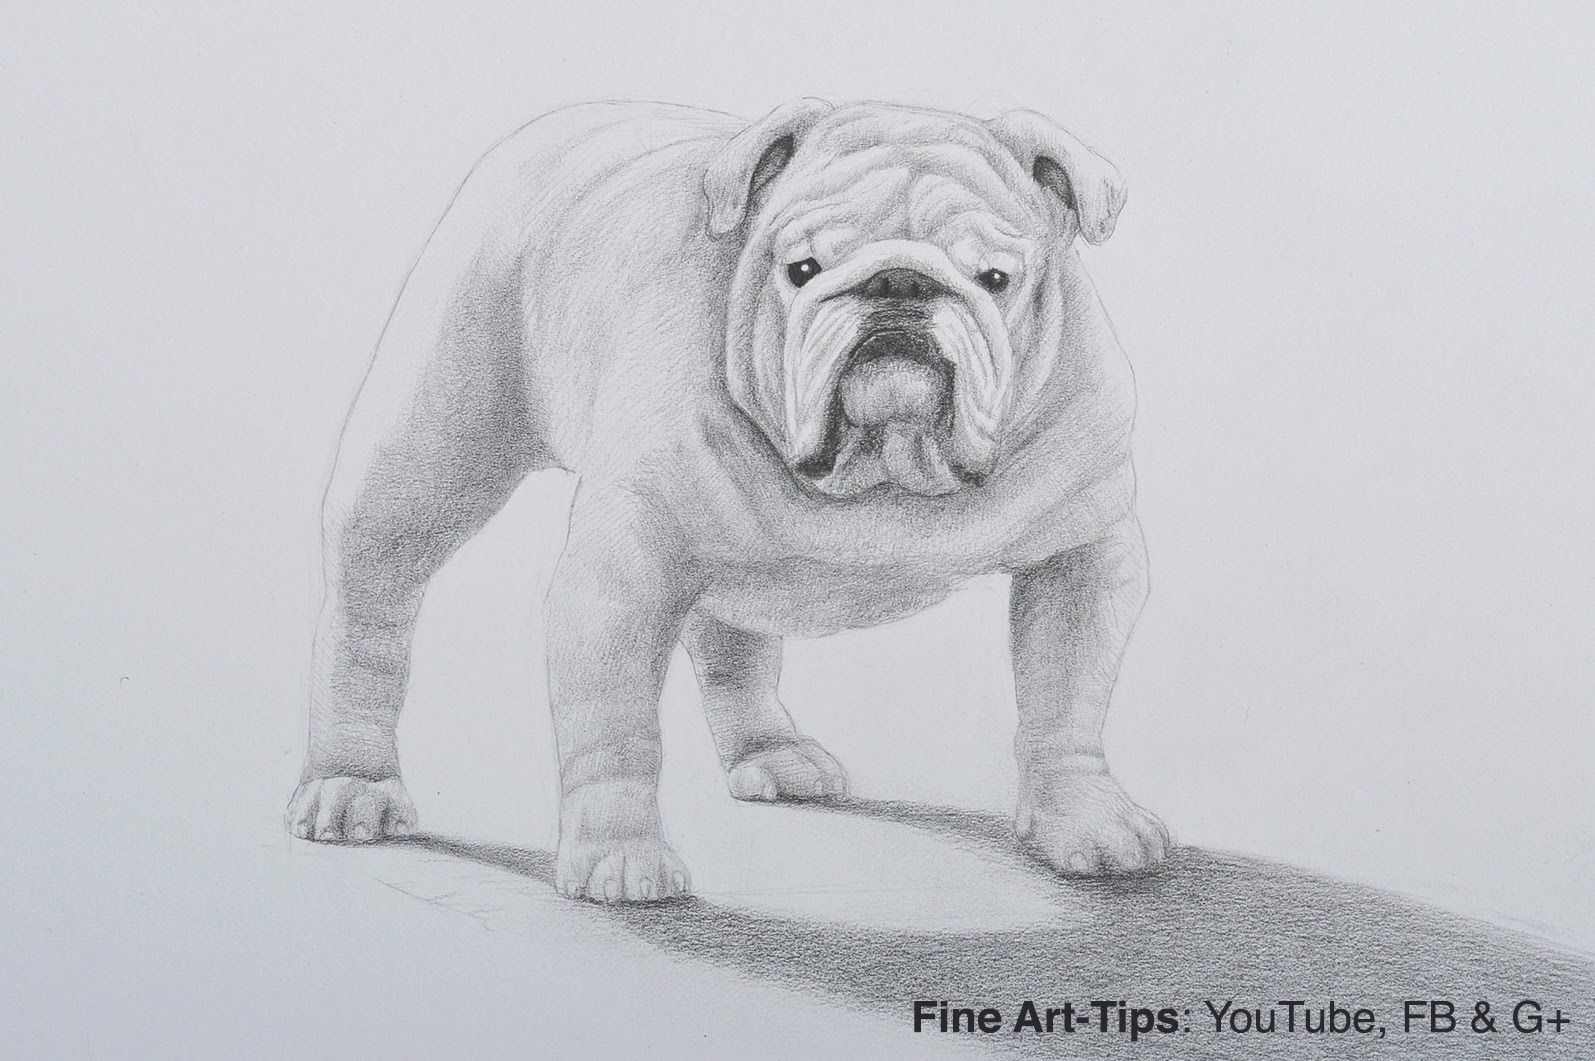 Drawn bulldog pencil drawing Pencil Dog With Dog How